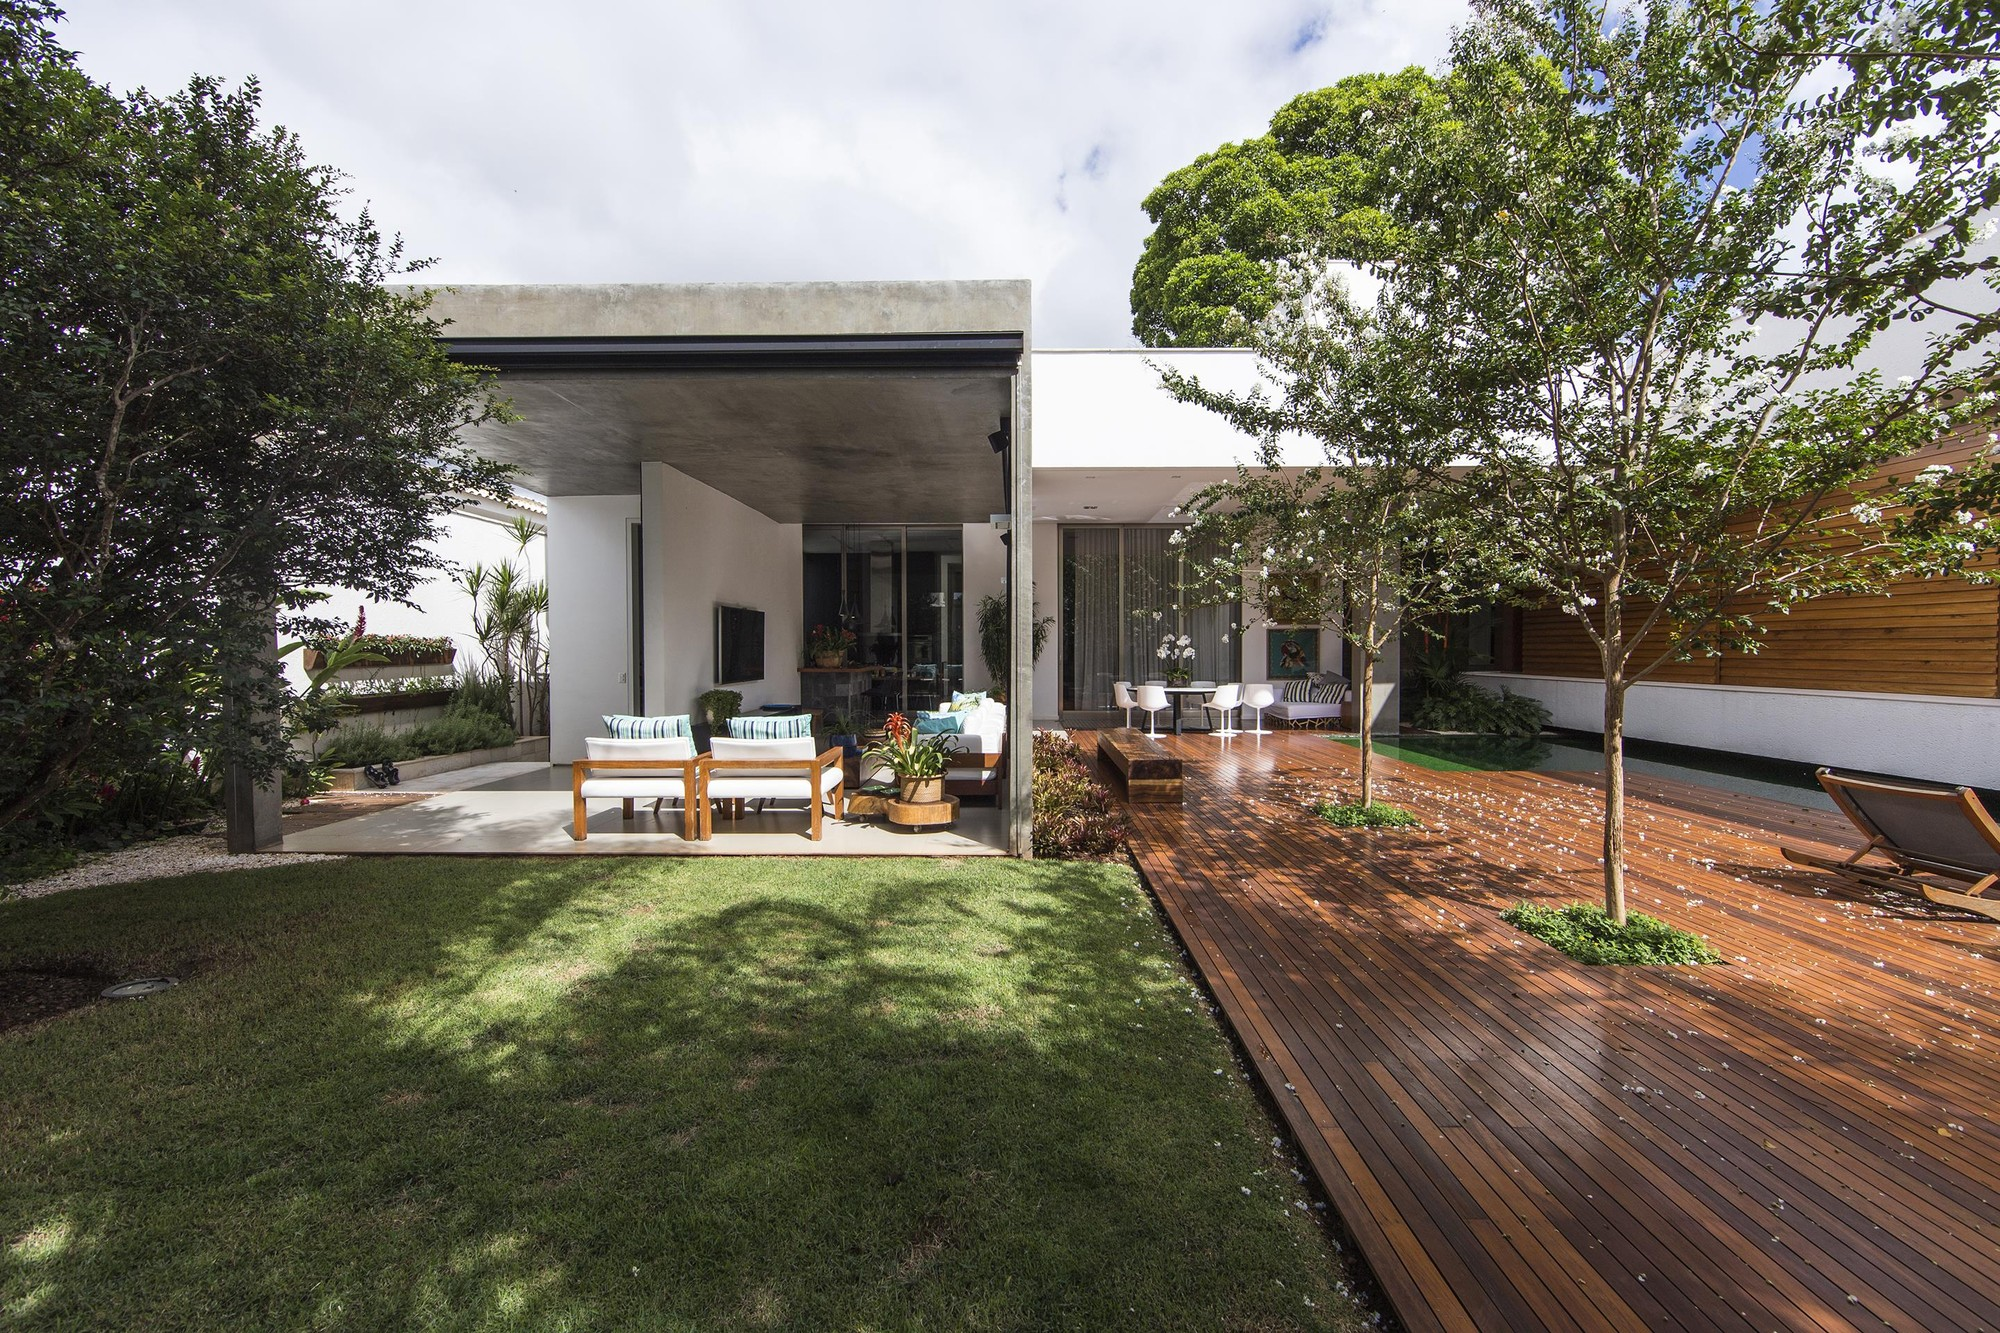 Residencia RMJ / Felipe Bueno & Alexandre Bueno, © Cae Oliveira